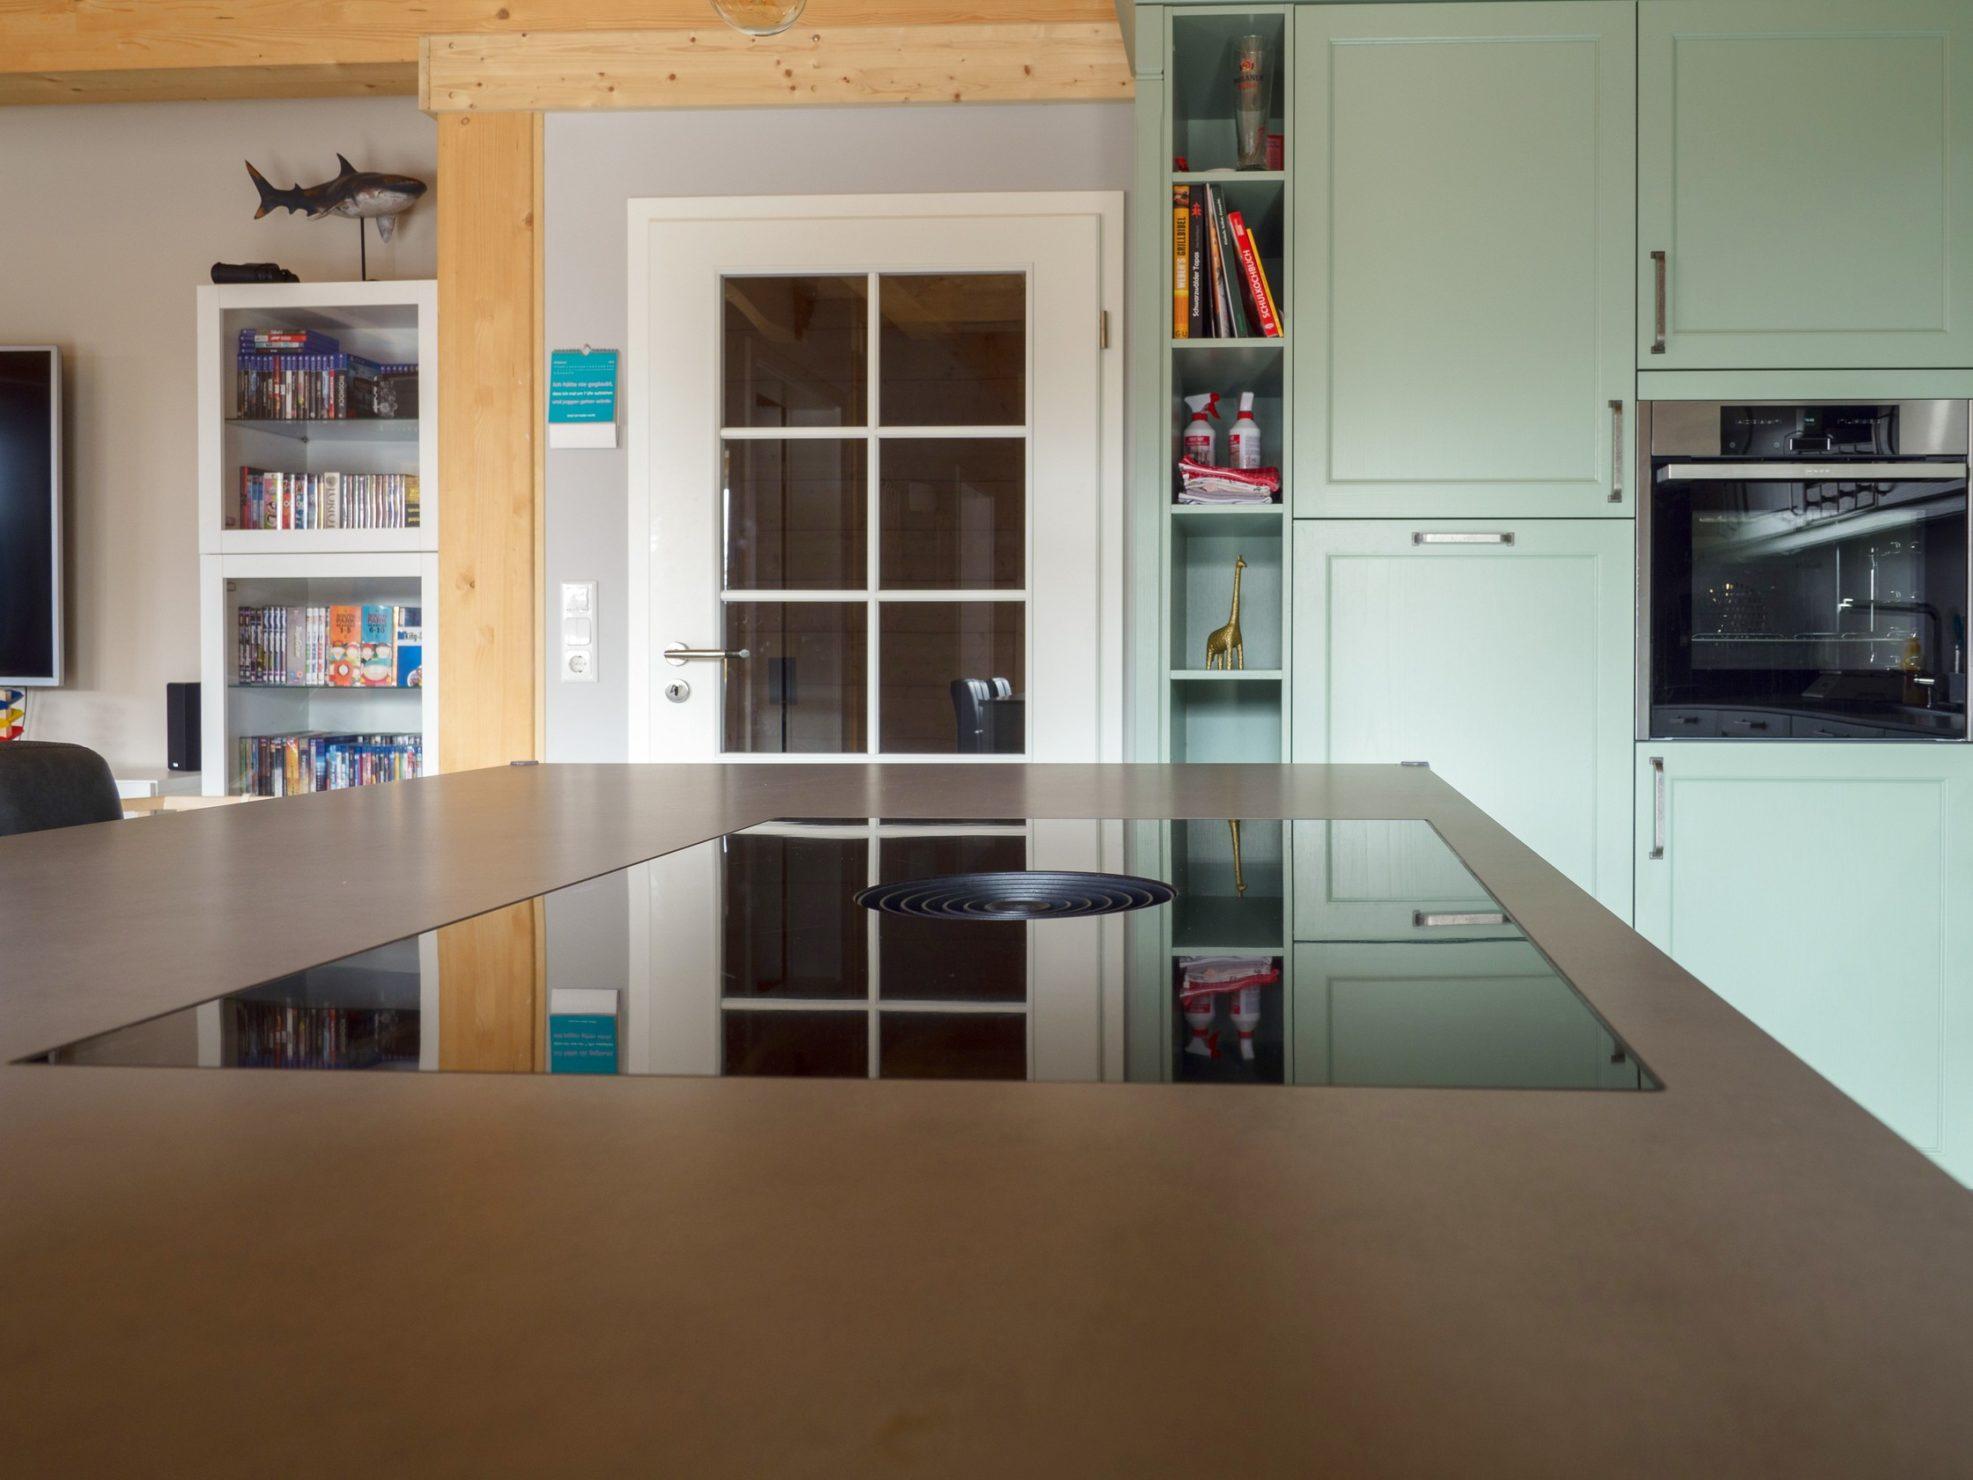 Kuechenhaus Thiemann Offene Landhaus Kueche Pastellgruen Keramikarbeitsplatte Neff Geraeten Bora Kochfeld 13